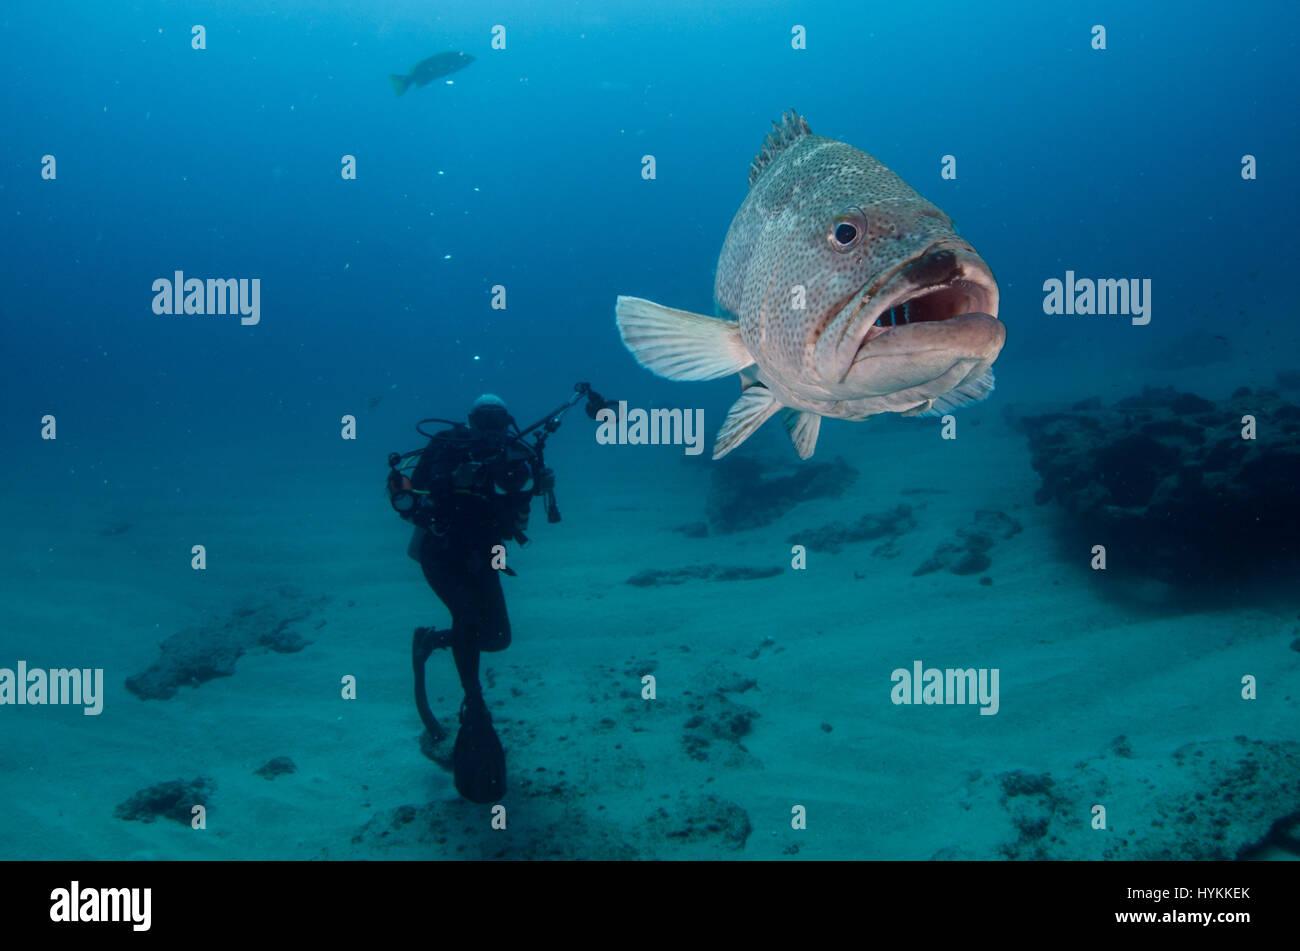 treasure chest underwater stock photos treasure chest underwater